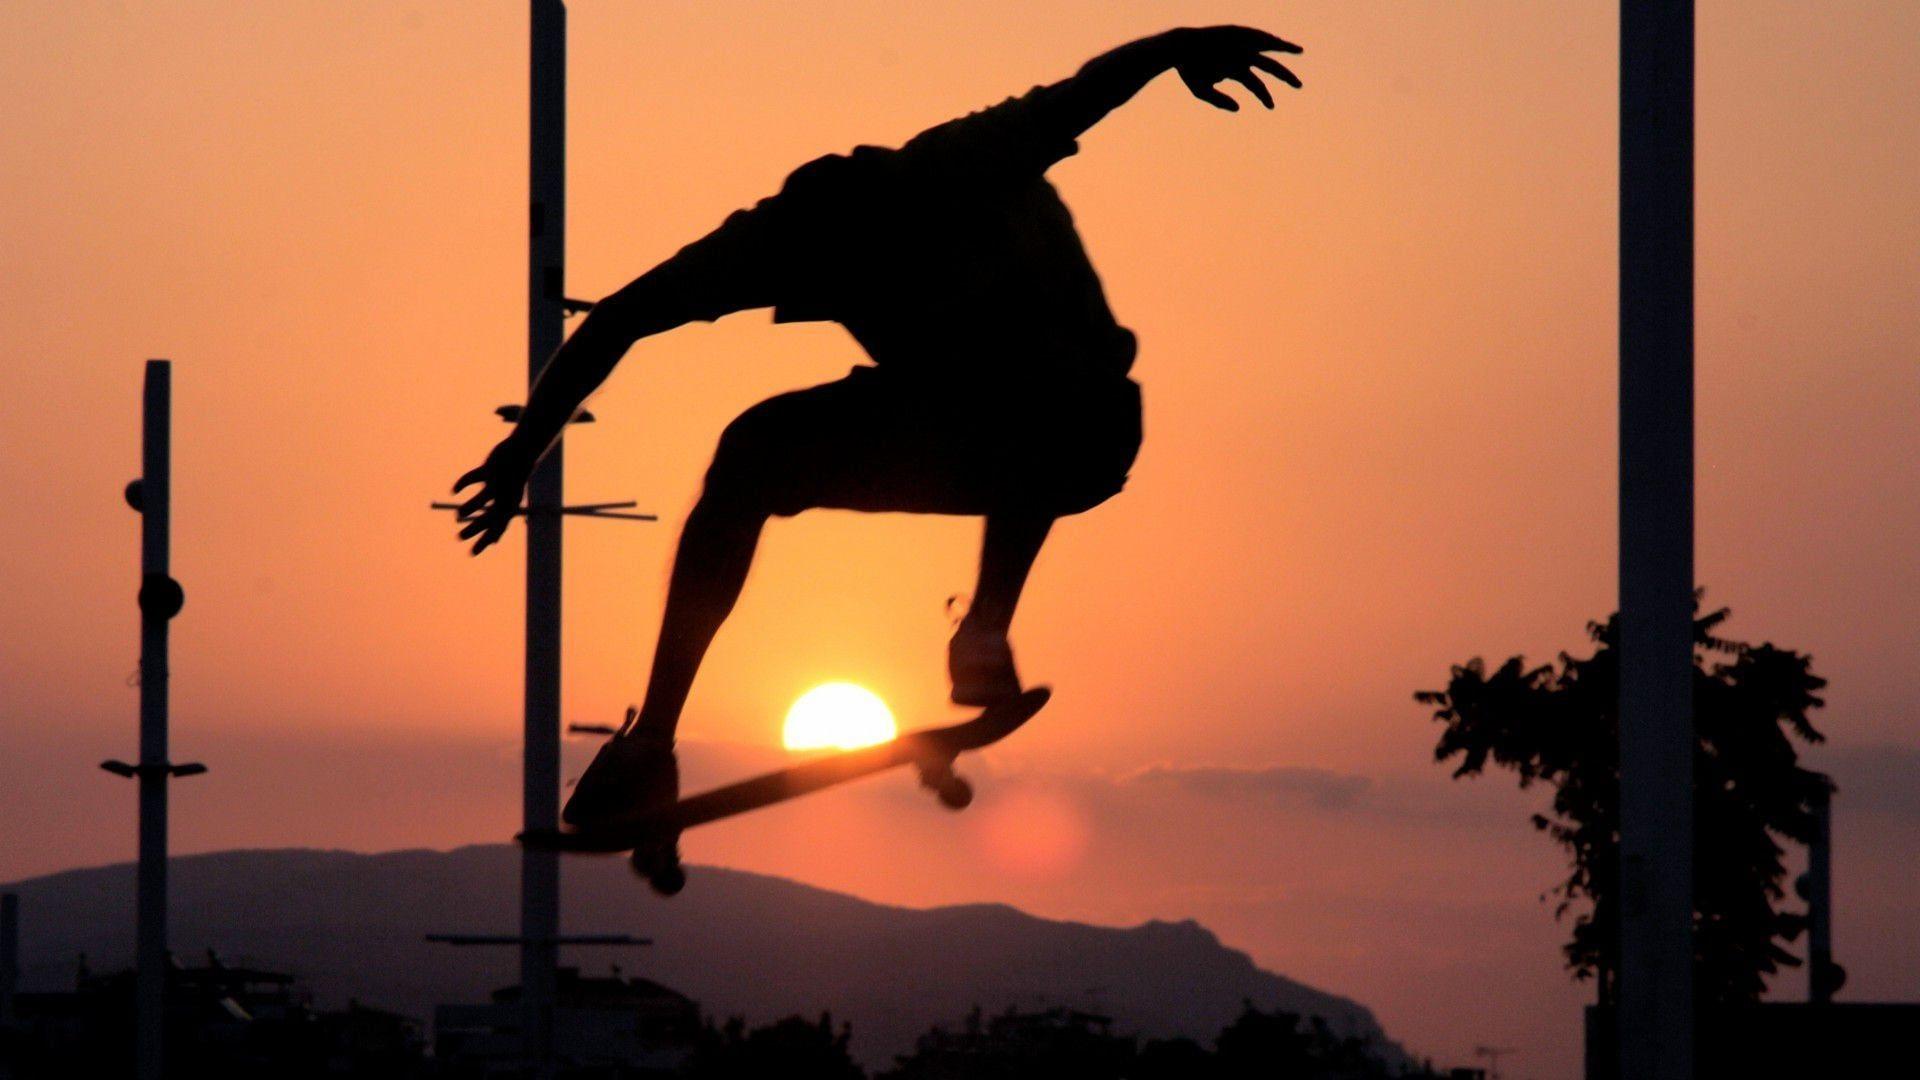 Res: 1920x1080, Volcom Wallpaper Skate Images Guru 1920×1200 Skateboarding Wallpaper (45  Wallpapers) | Adorable